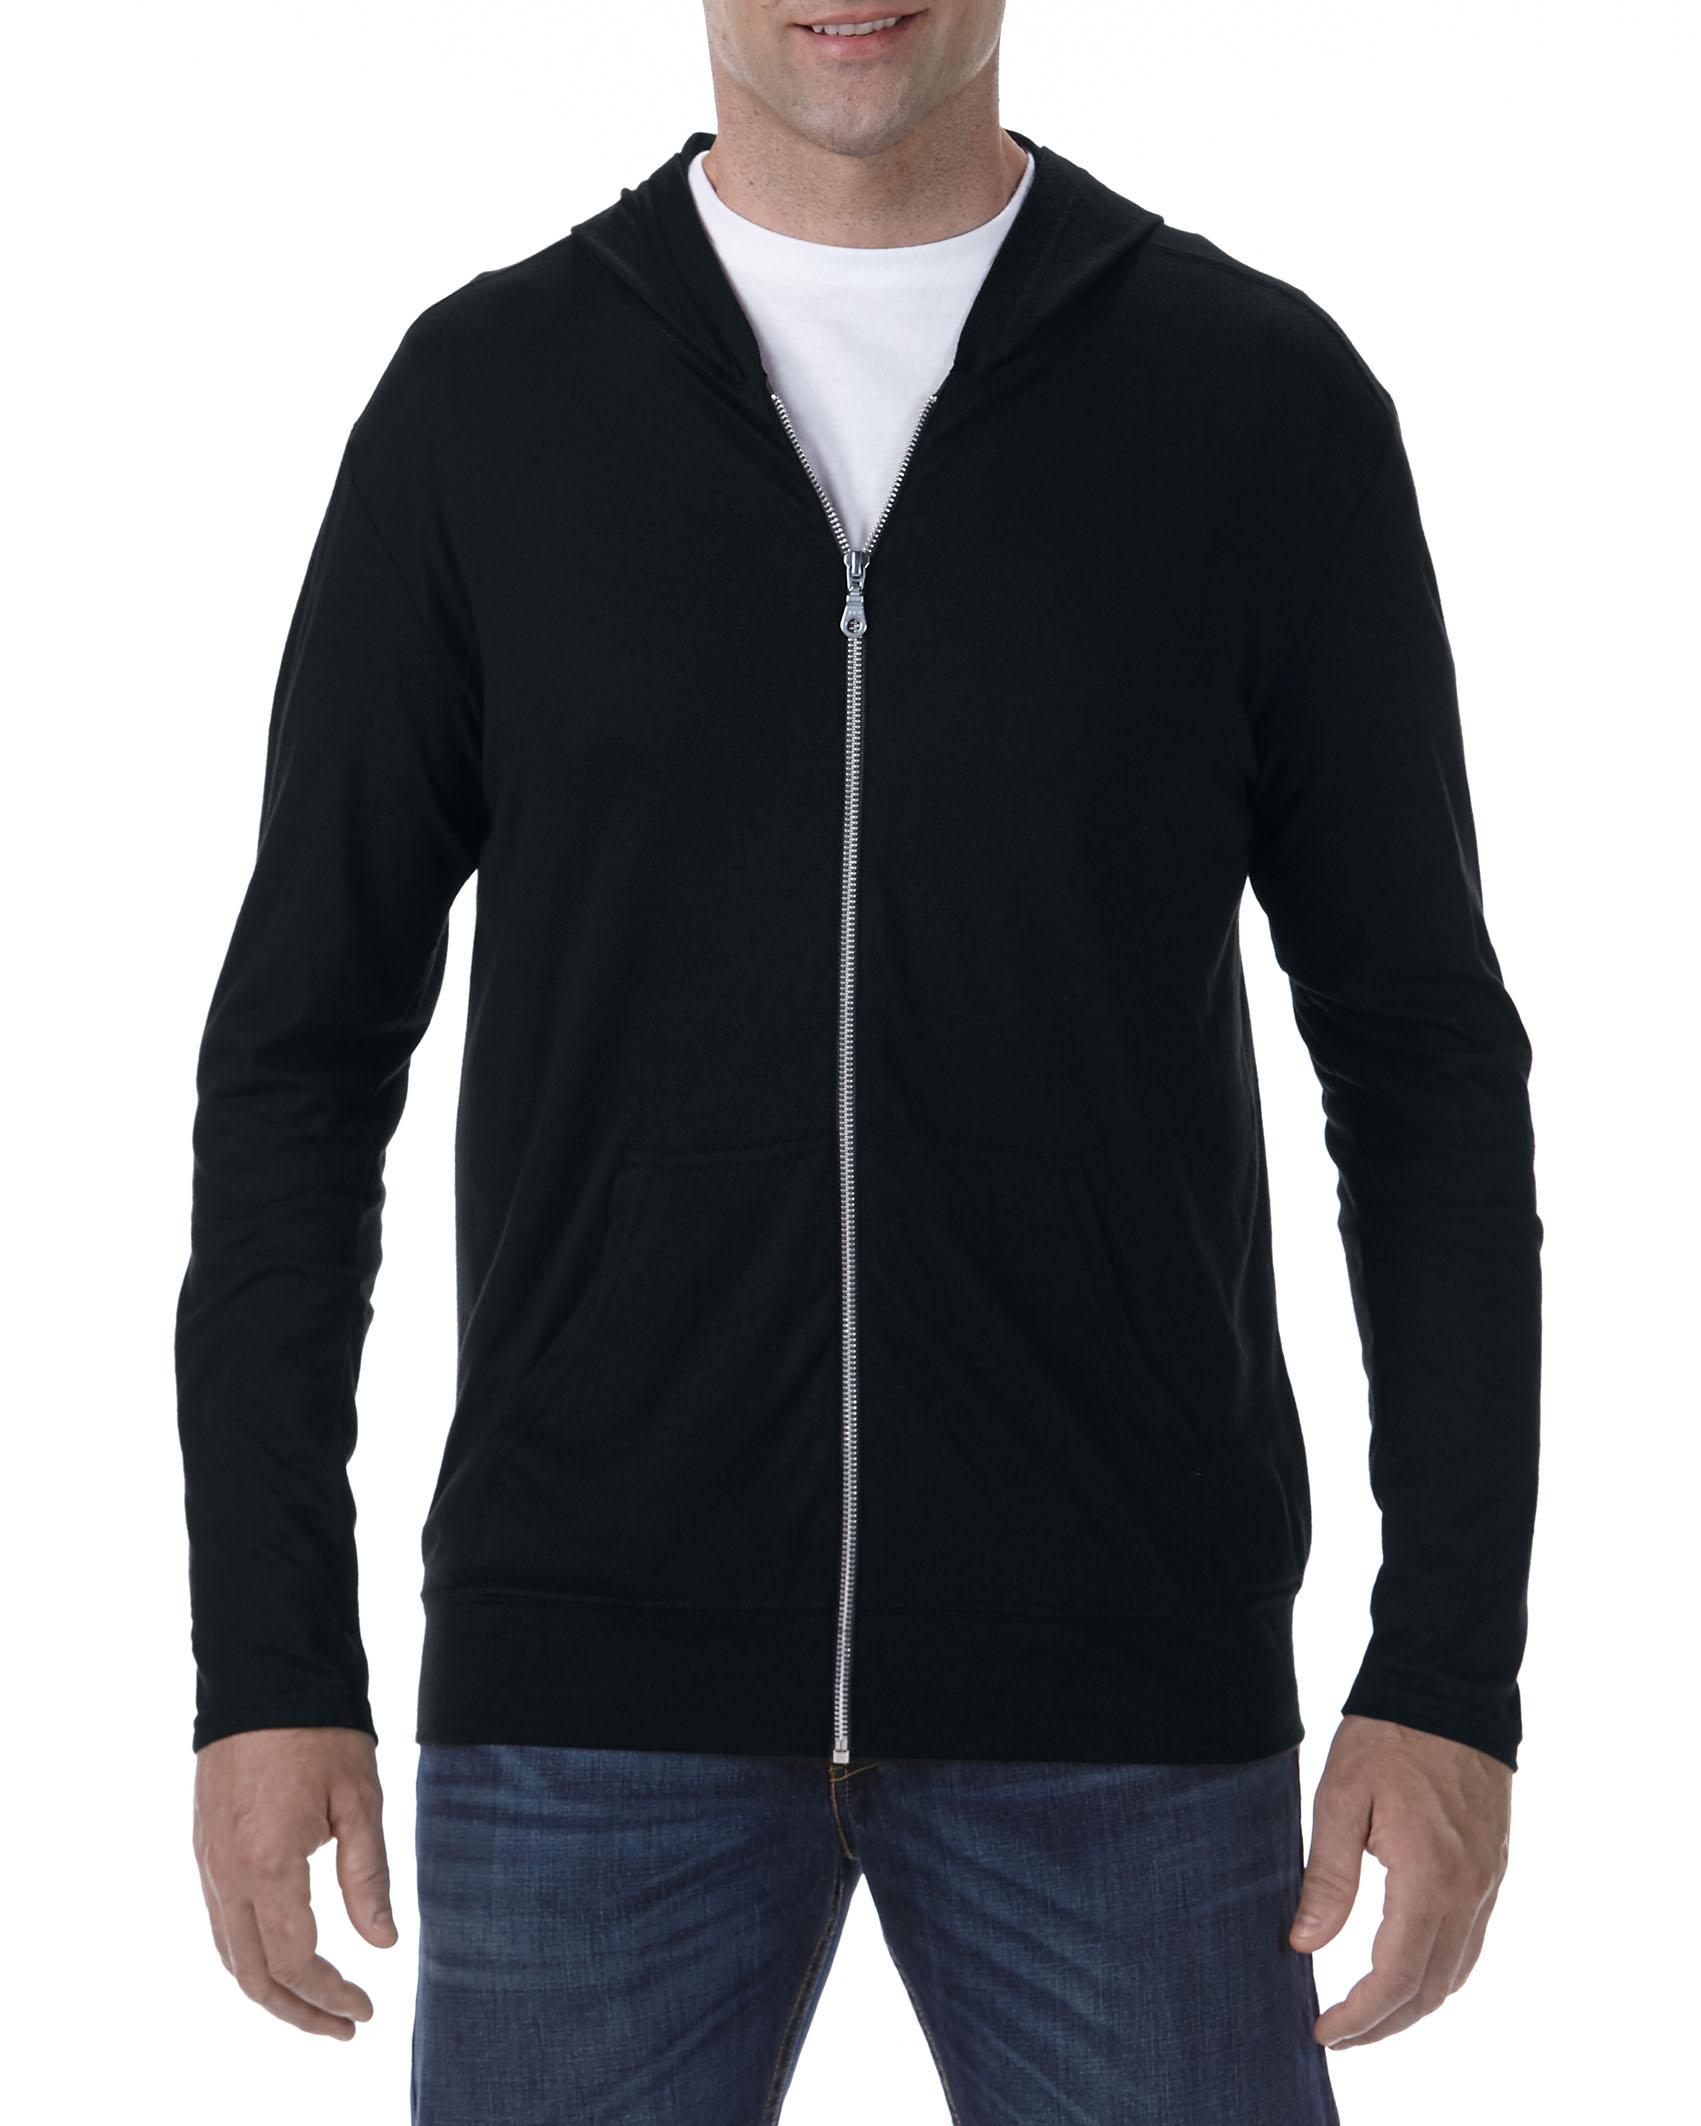 Anvil Jacket Hooded Full-Zip TriBlend for him